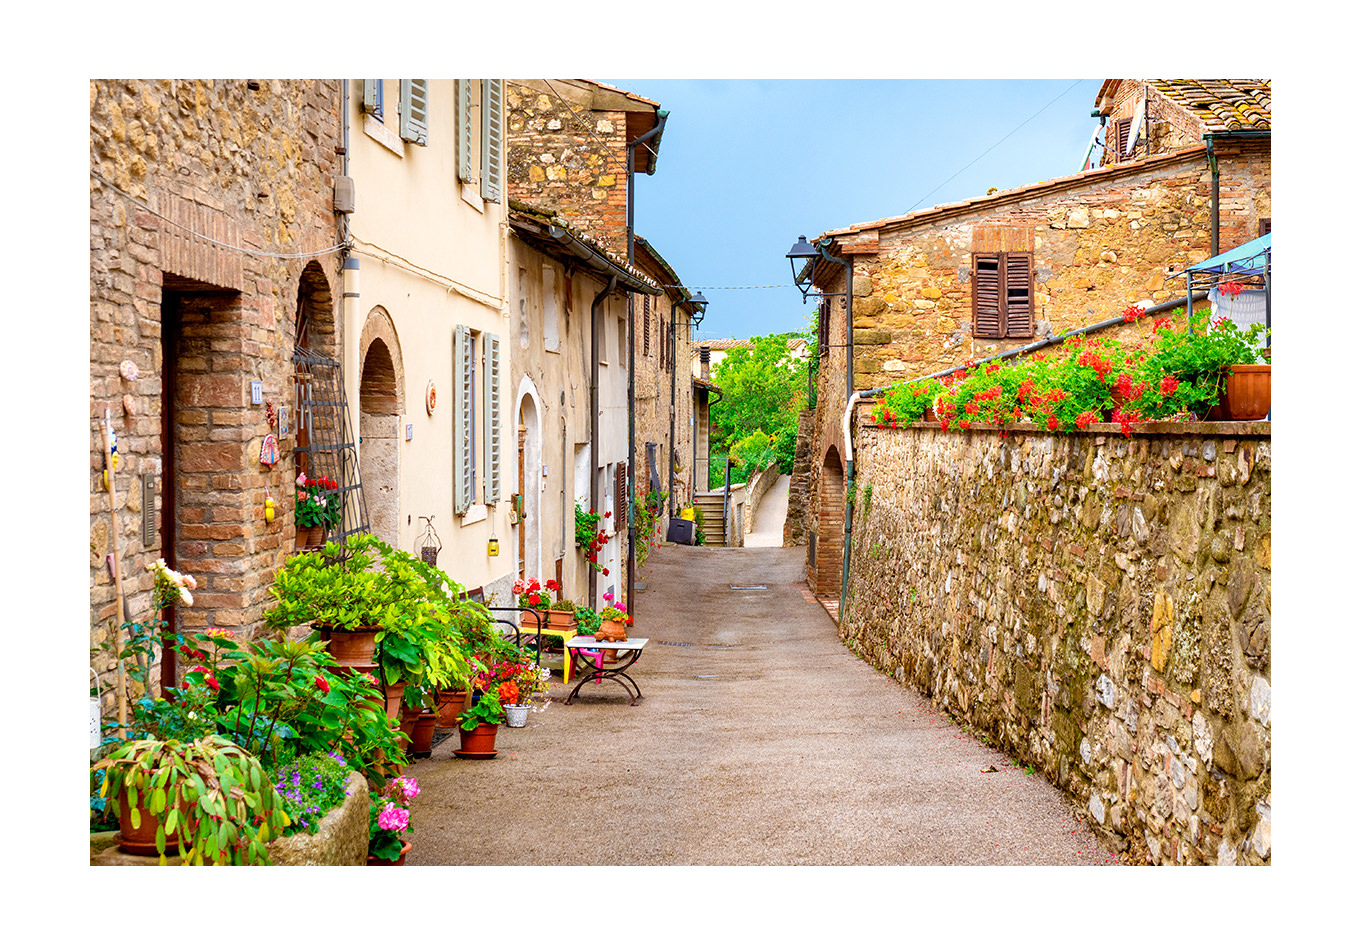 tuscany village photo print for sale